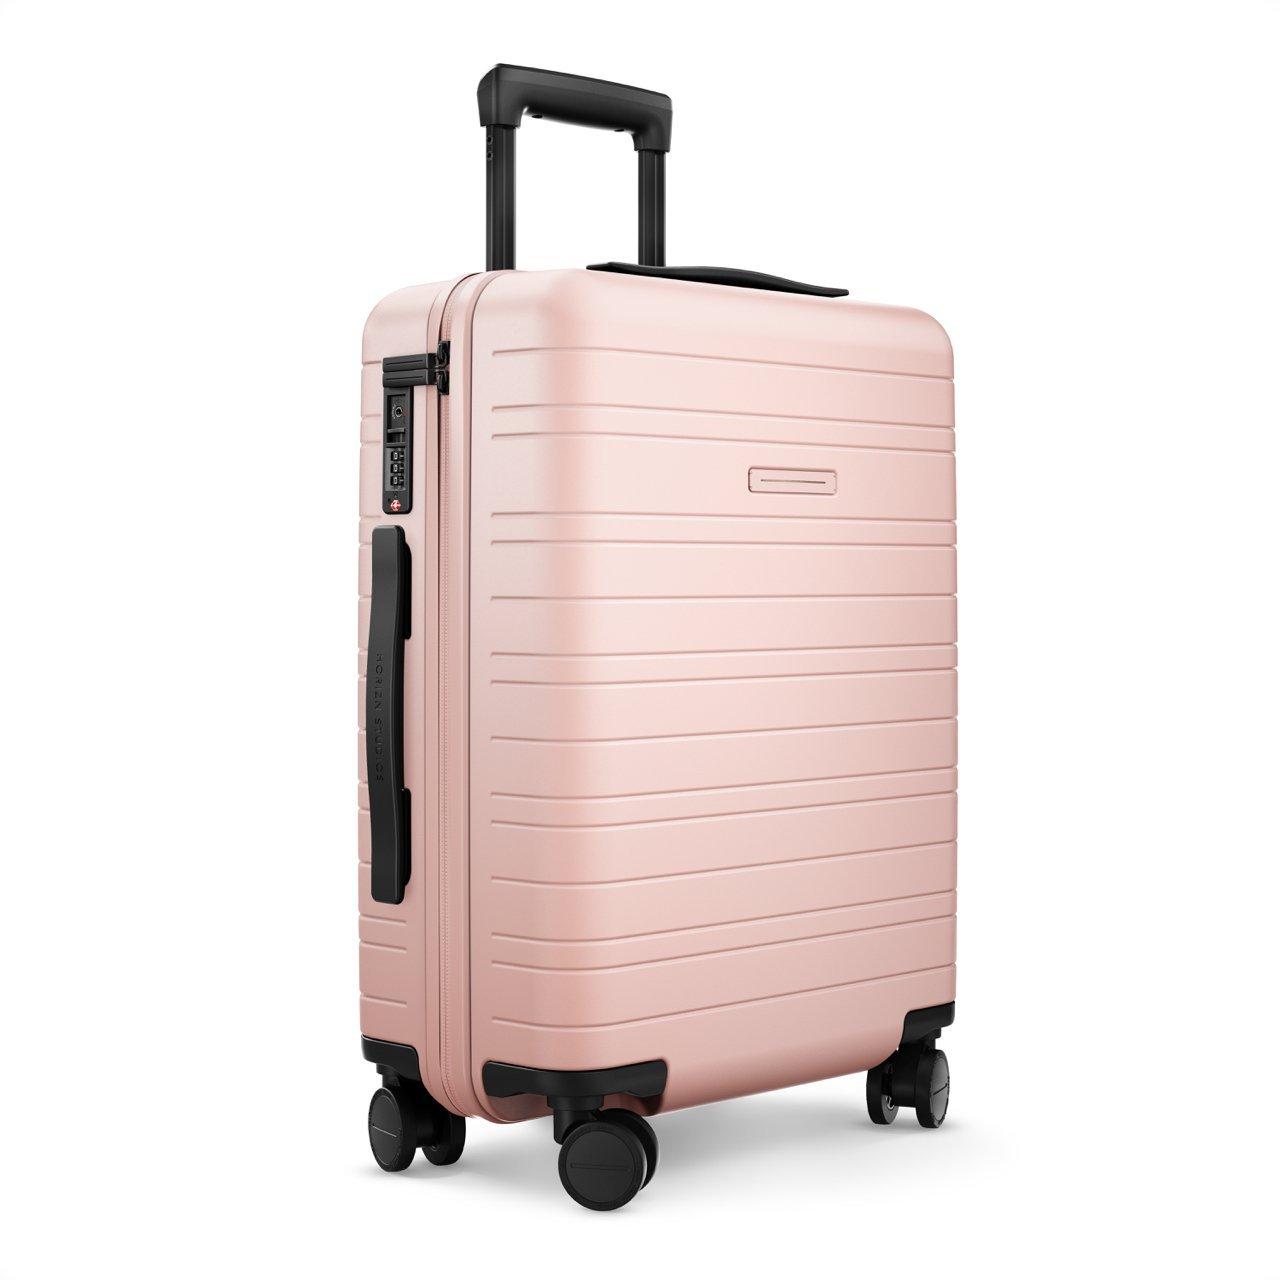 horizn studios carry on suitcase cabin trolley model h 55 cm 35 l 4 wheels lightweight. Black Bedroom Furniture Sets. Home Design Ideas